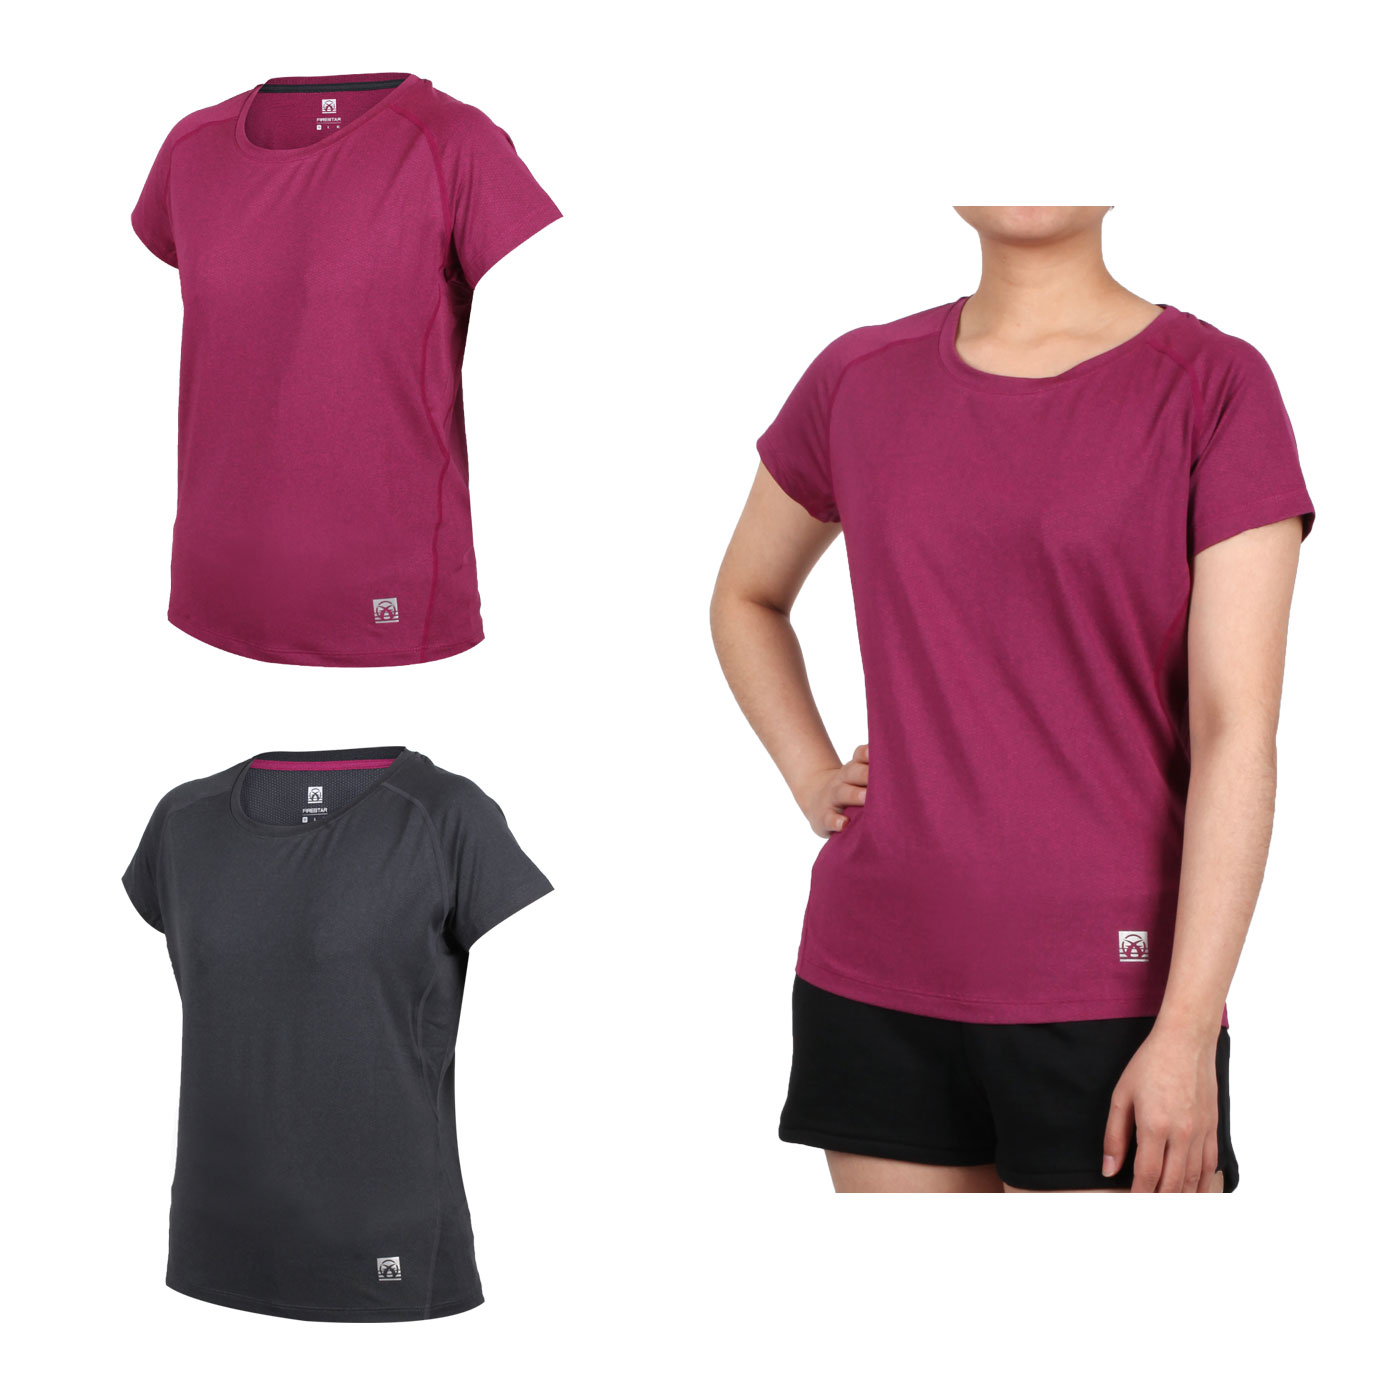 FIRESTAR 女款彈性剪接圓領短袖T恤 DL060-19